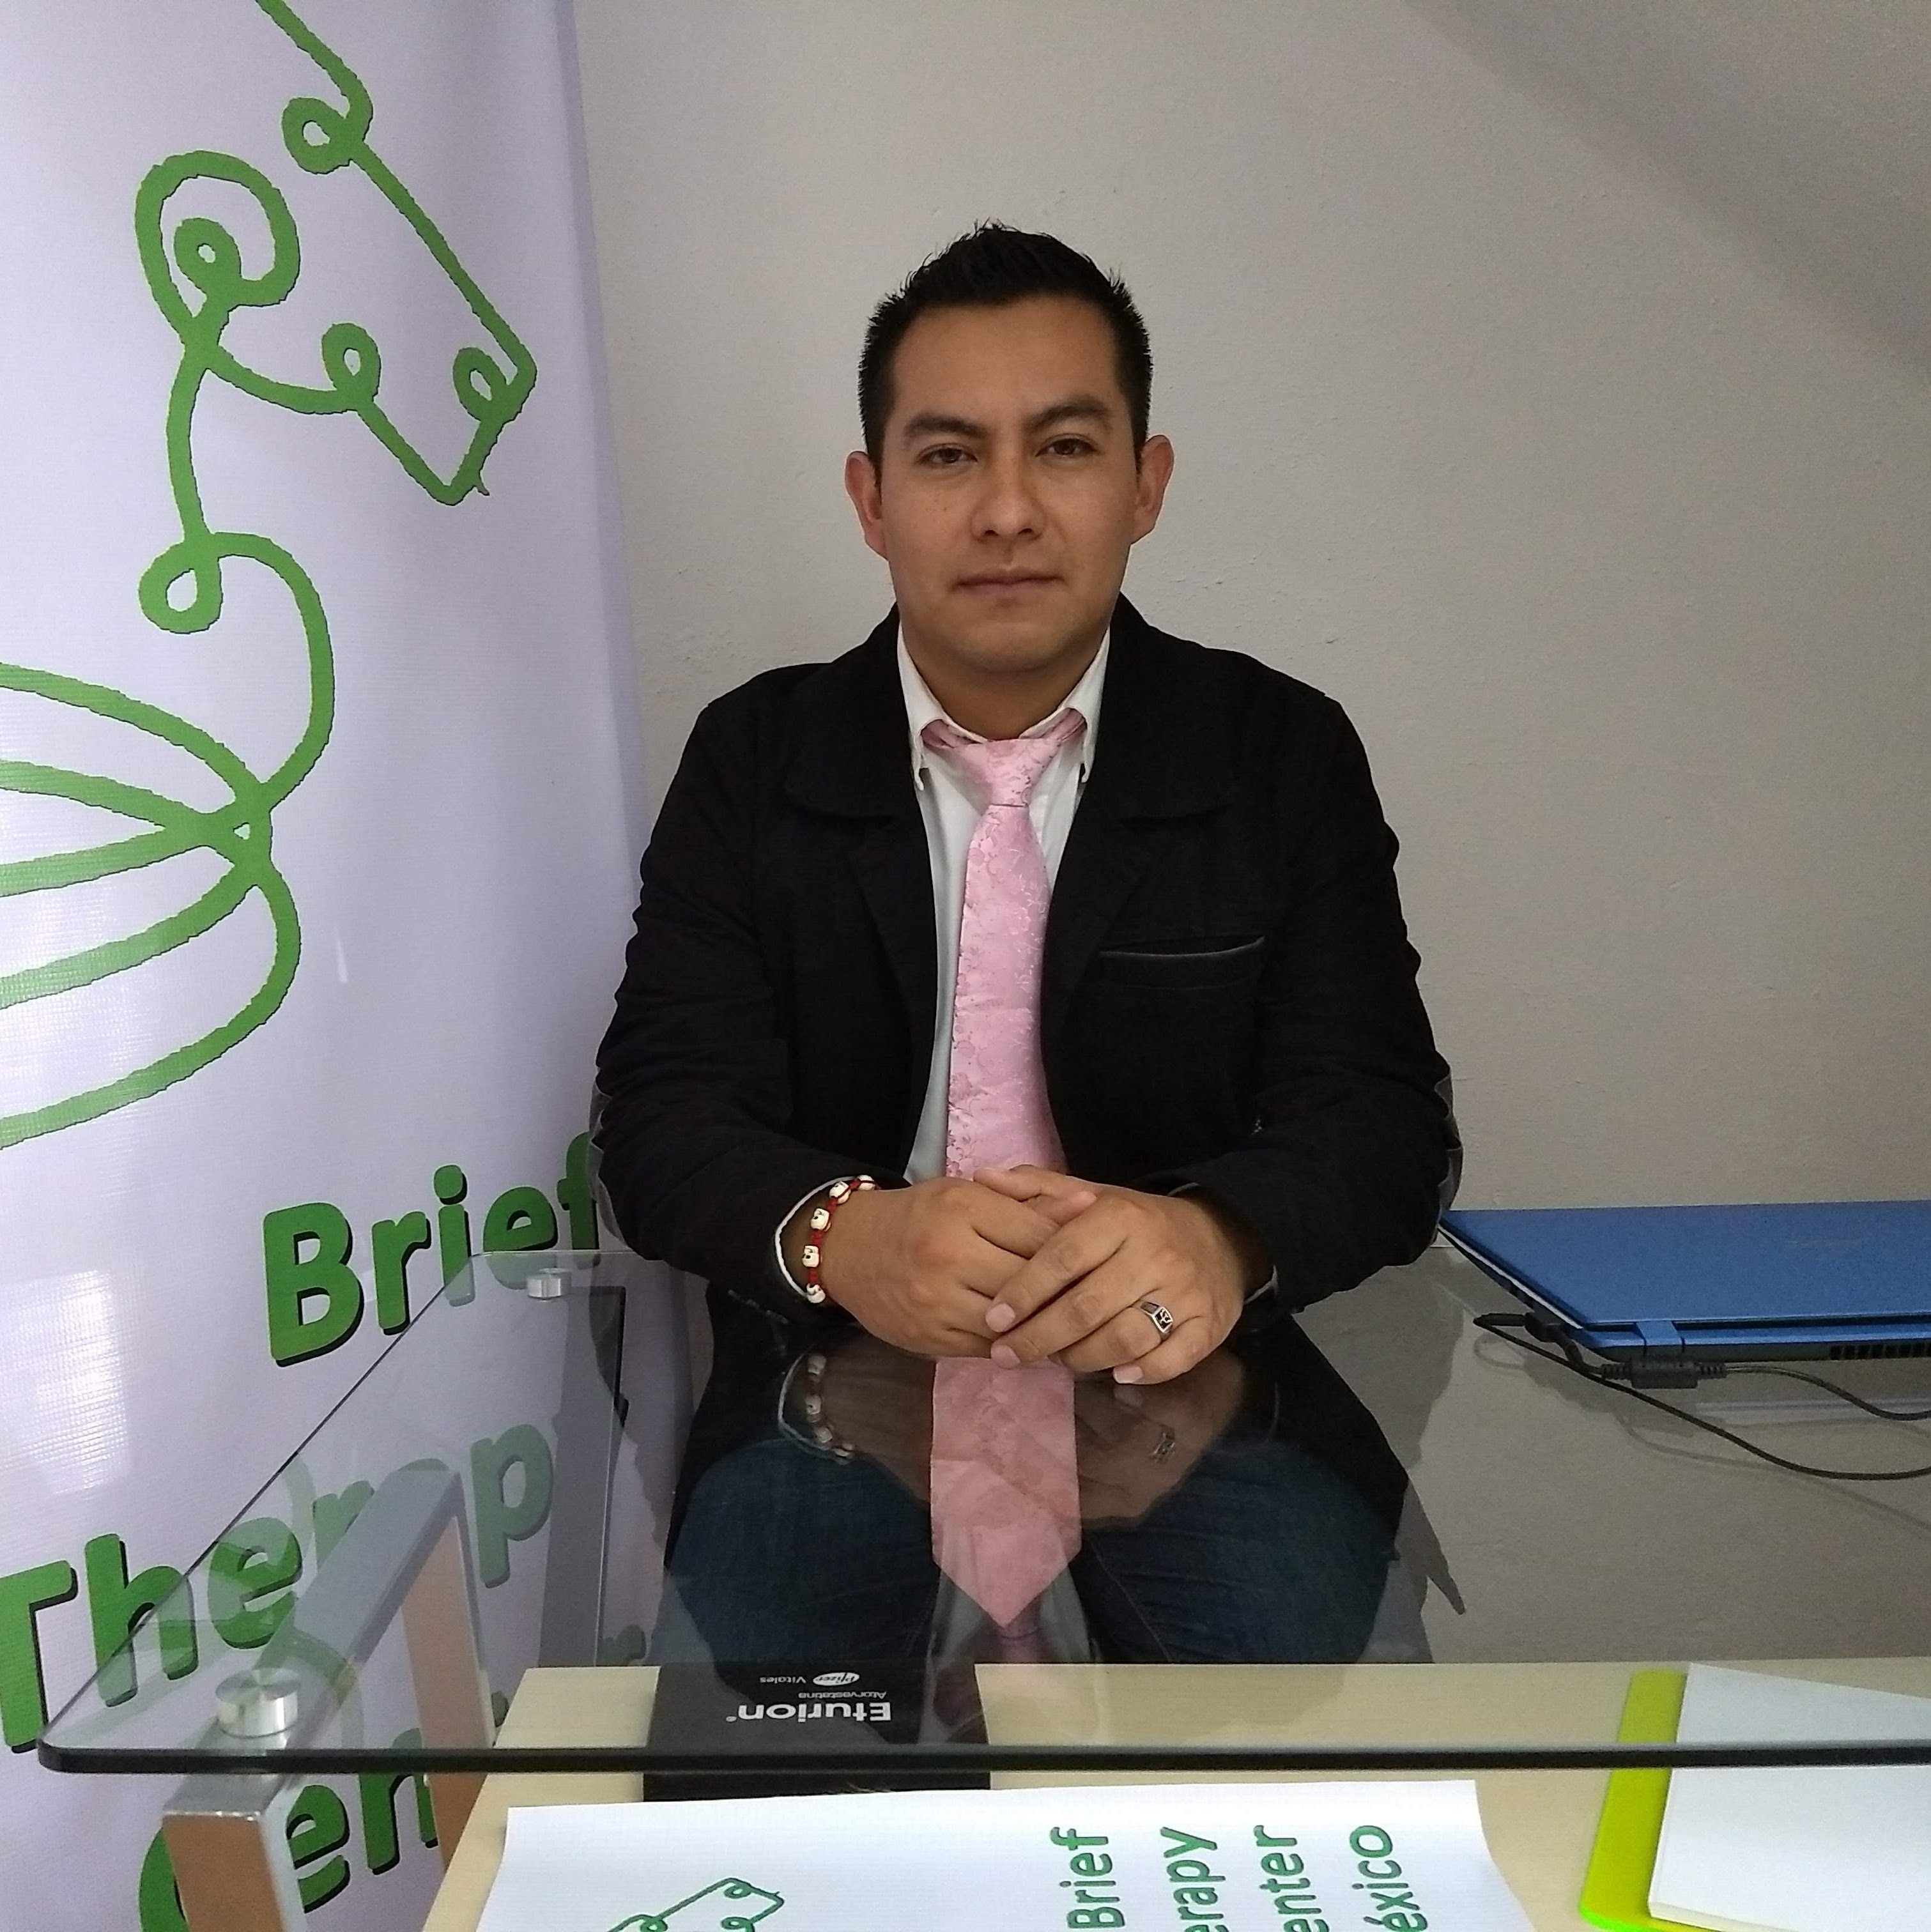 Luis Angel Díaz Martínez